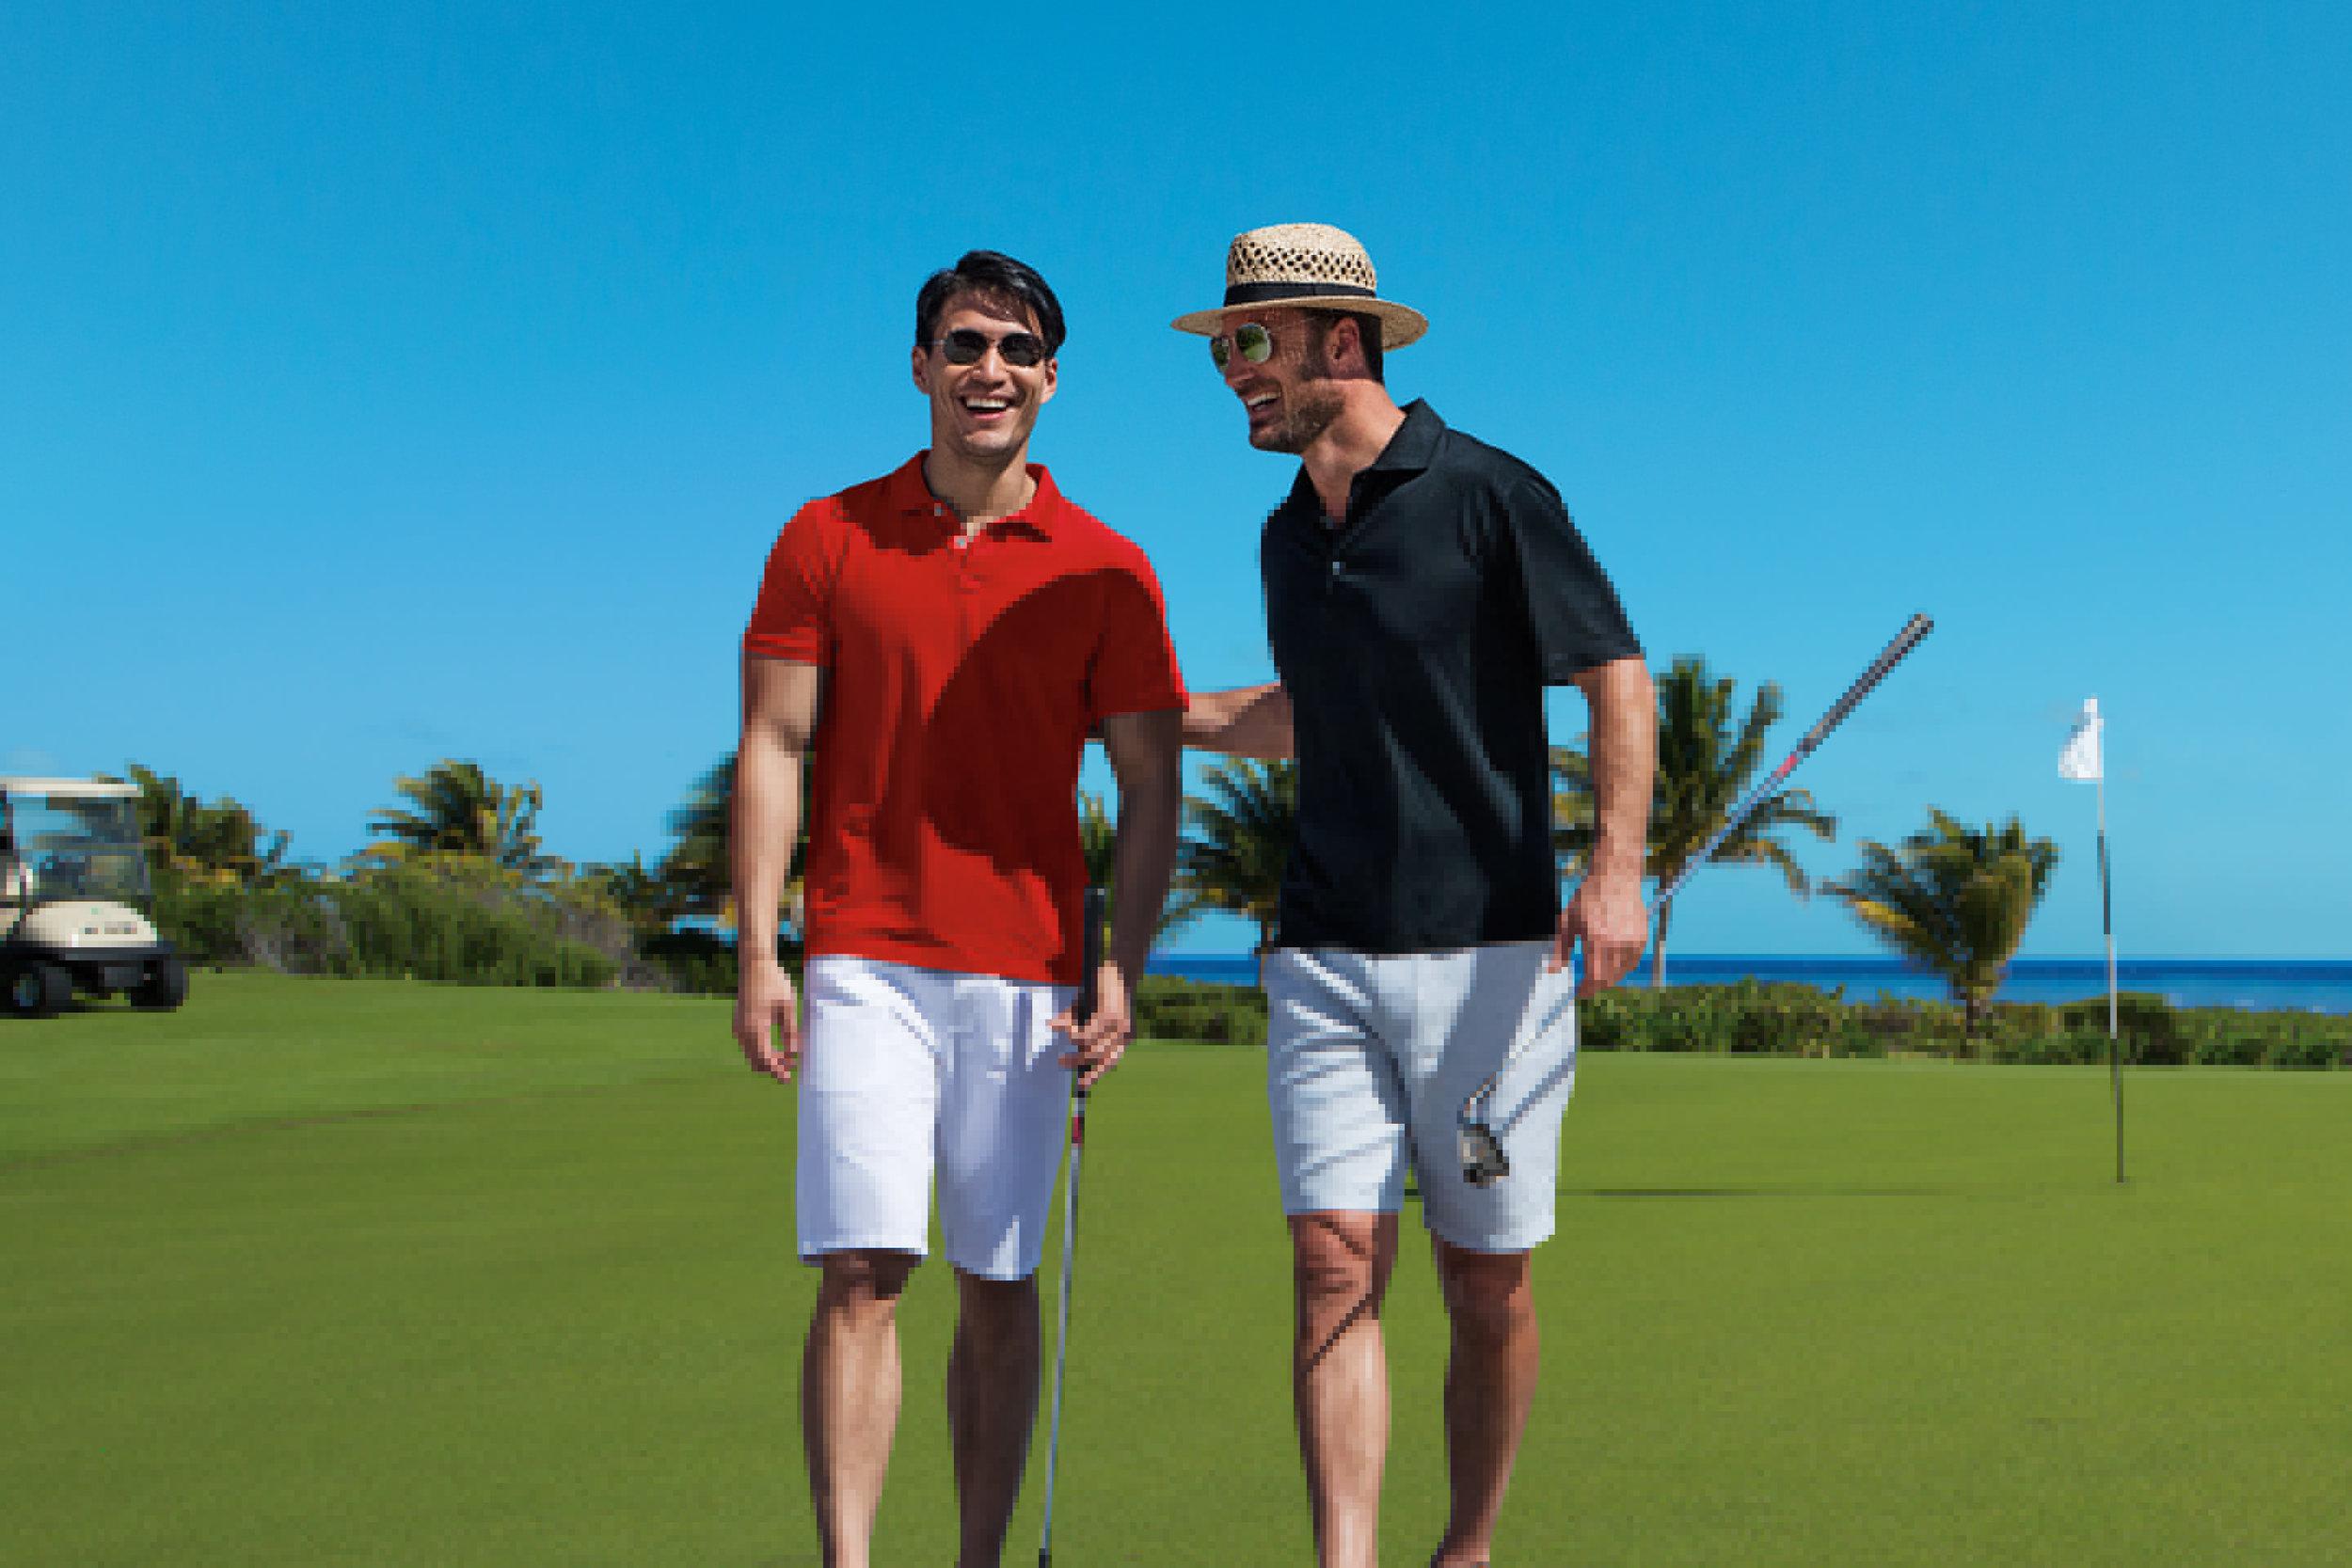 BRCSL_GroupMen_Golf2_2A_1.jpg